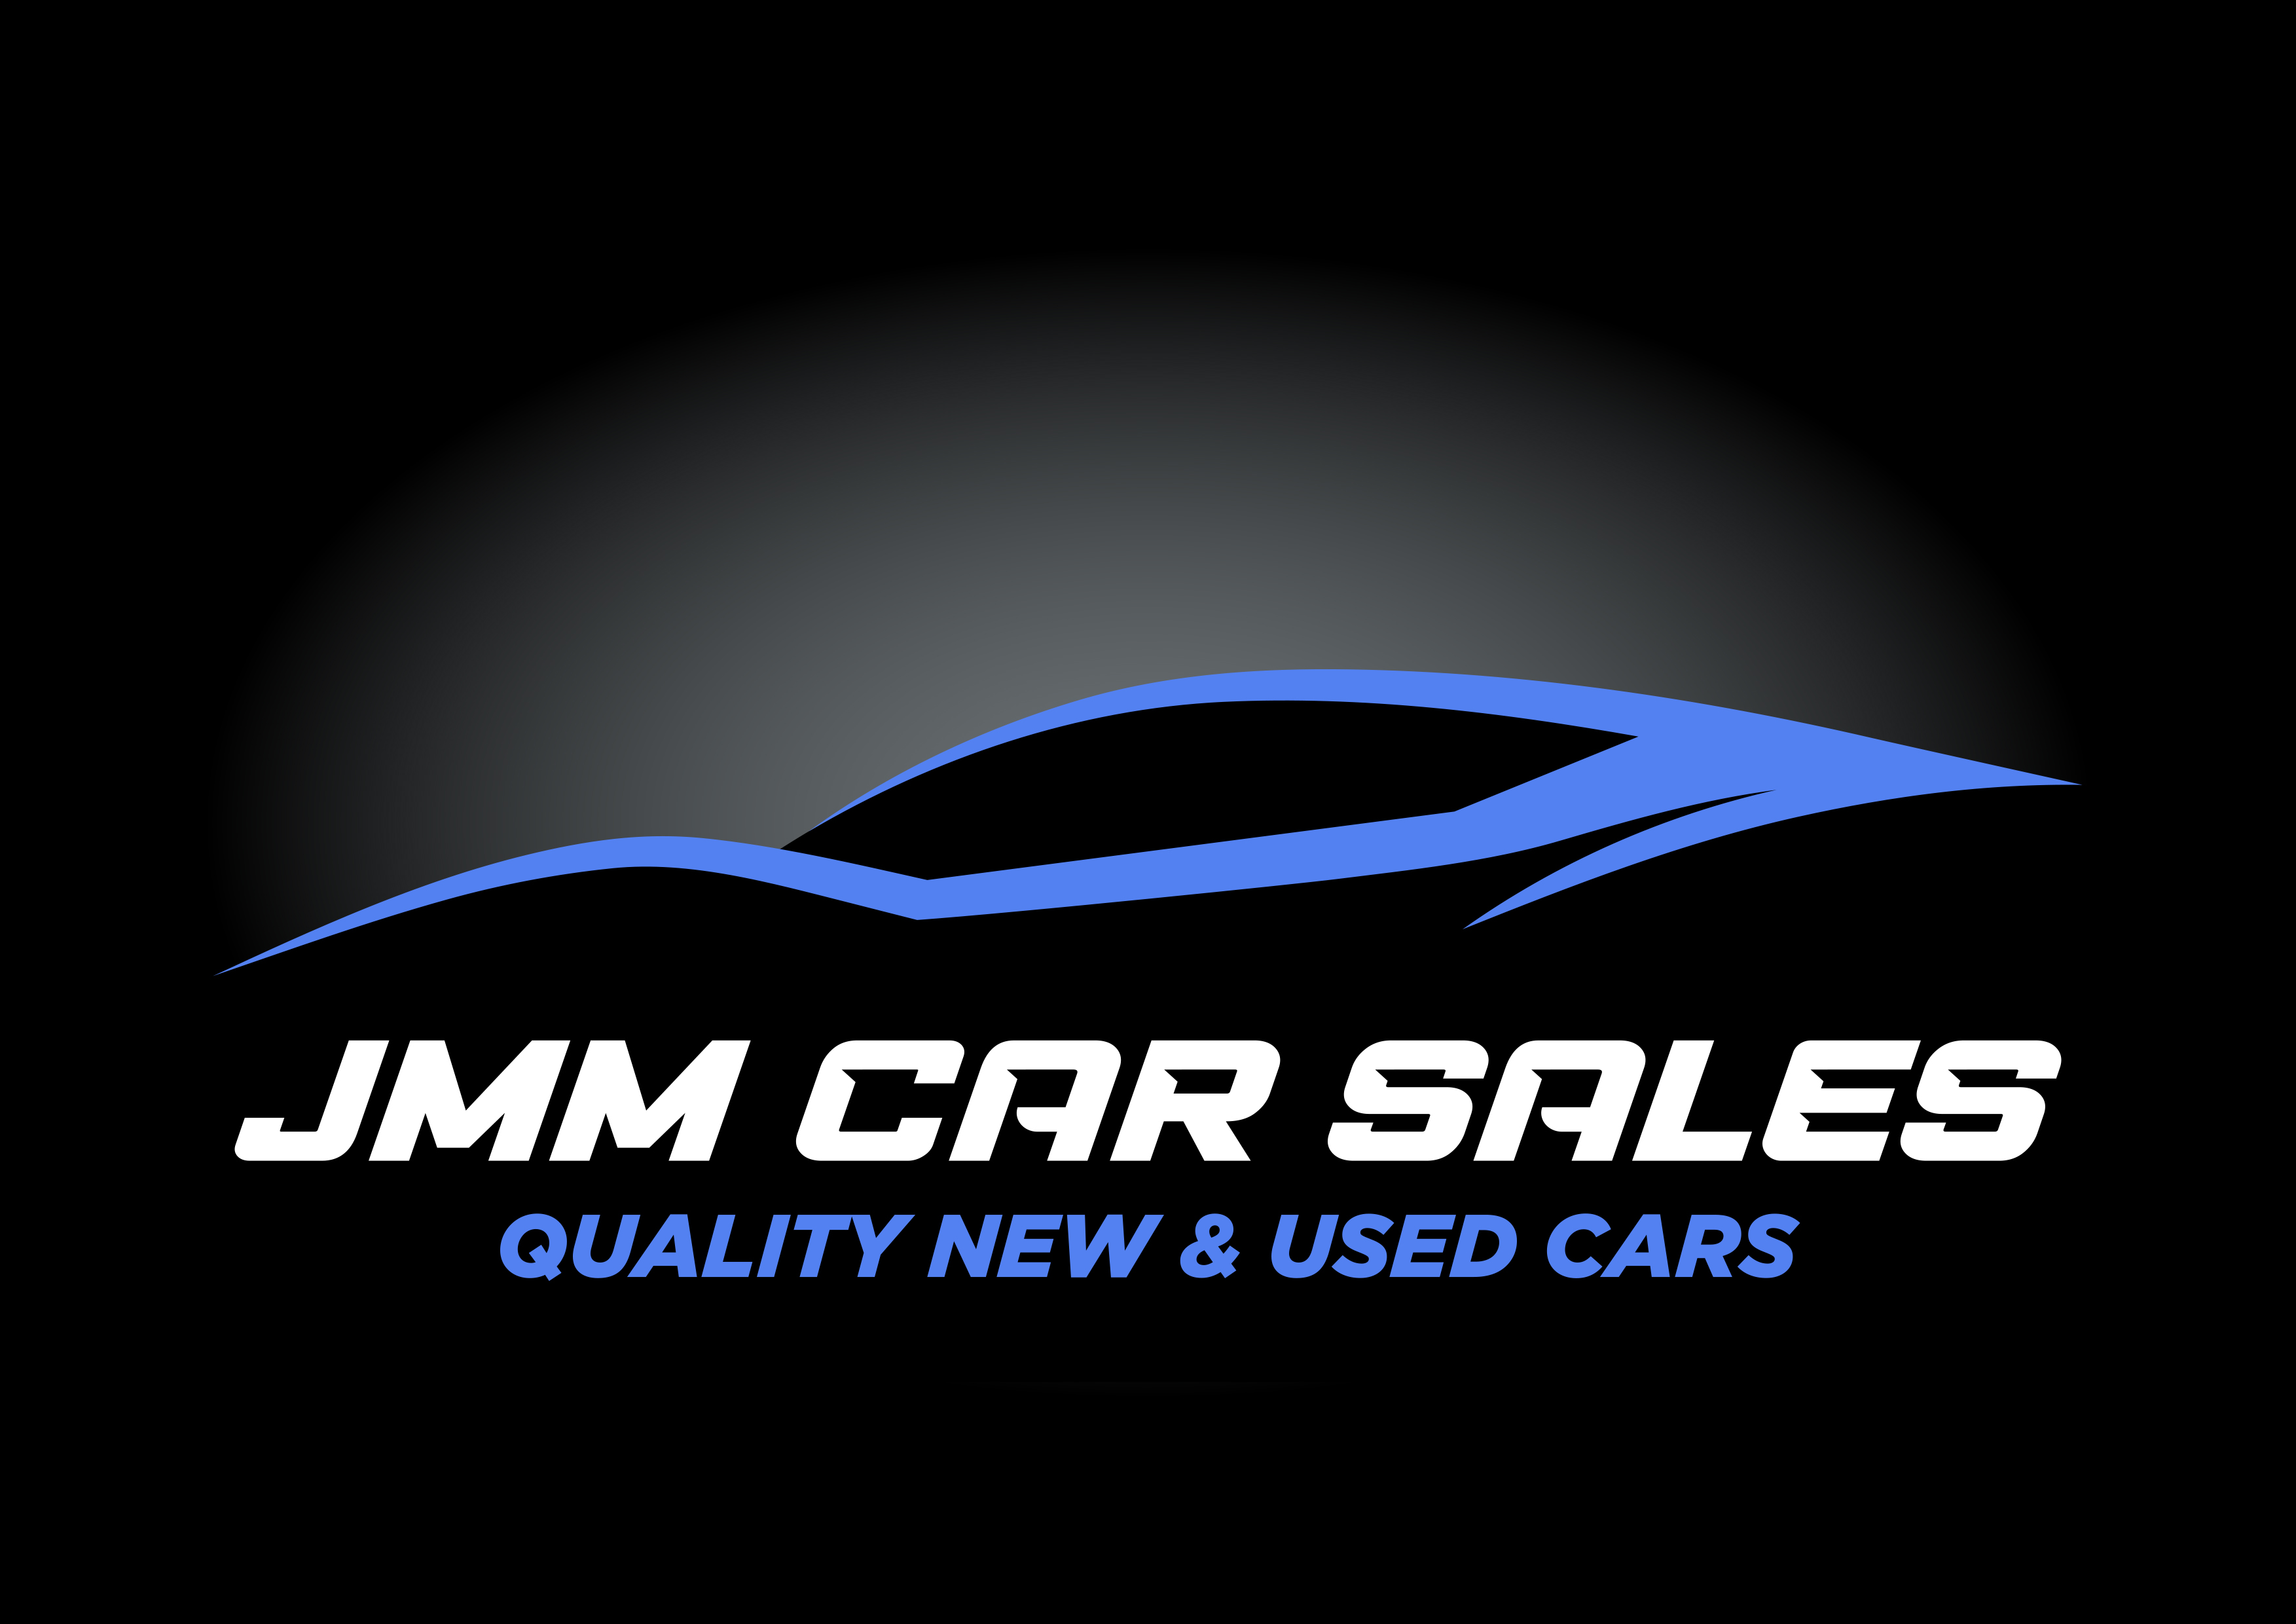 JMM Car Sales, Newtownards